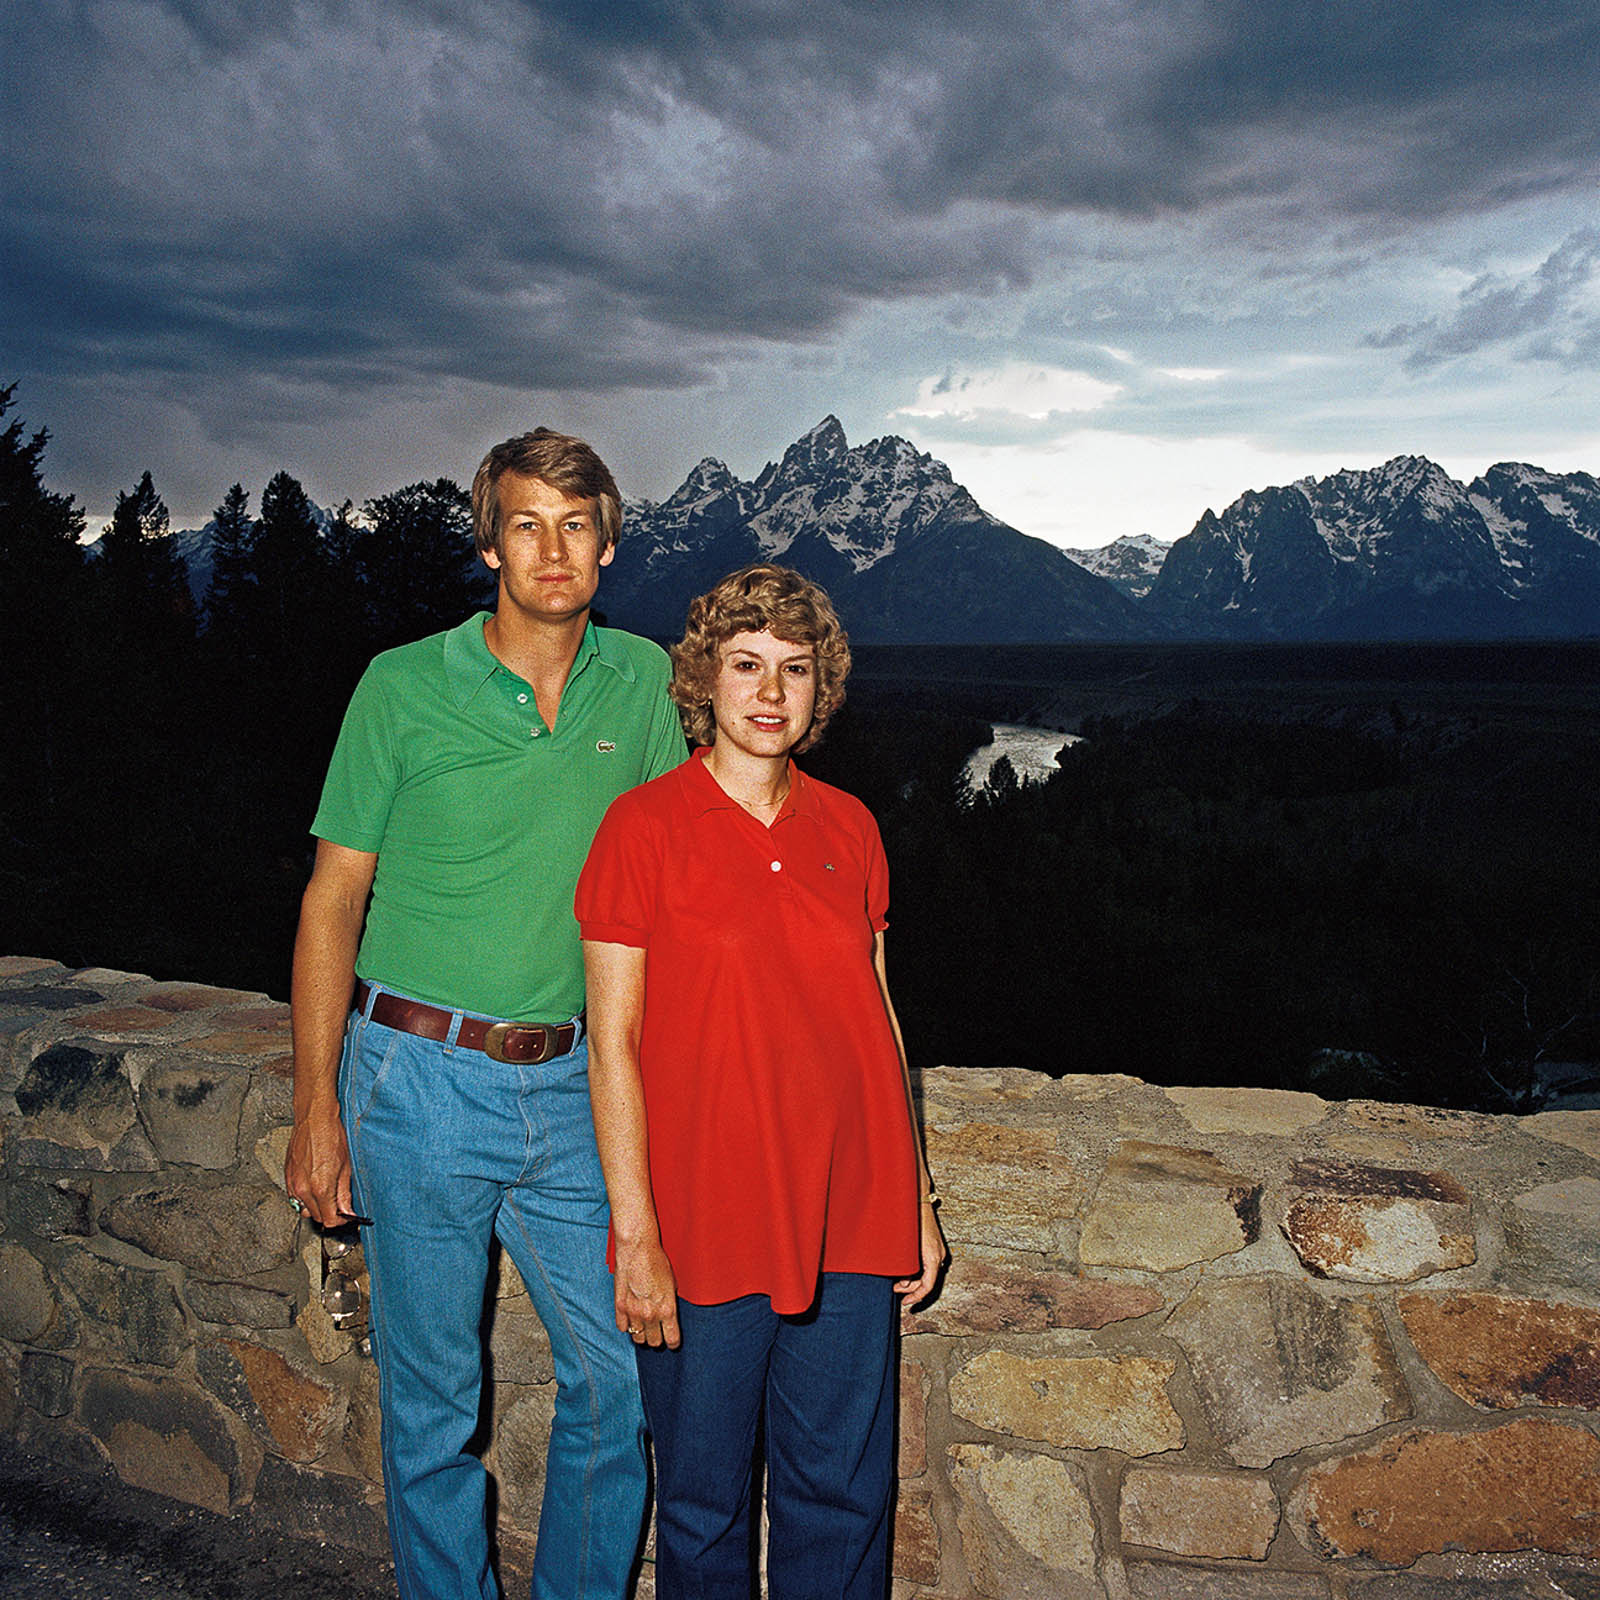 Couple at Snake River, Grand Tetons National Park, Wyoming 1980